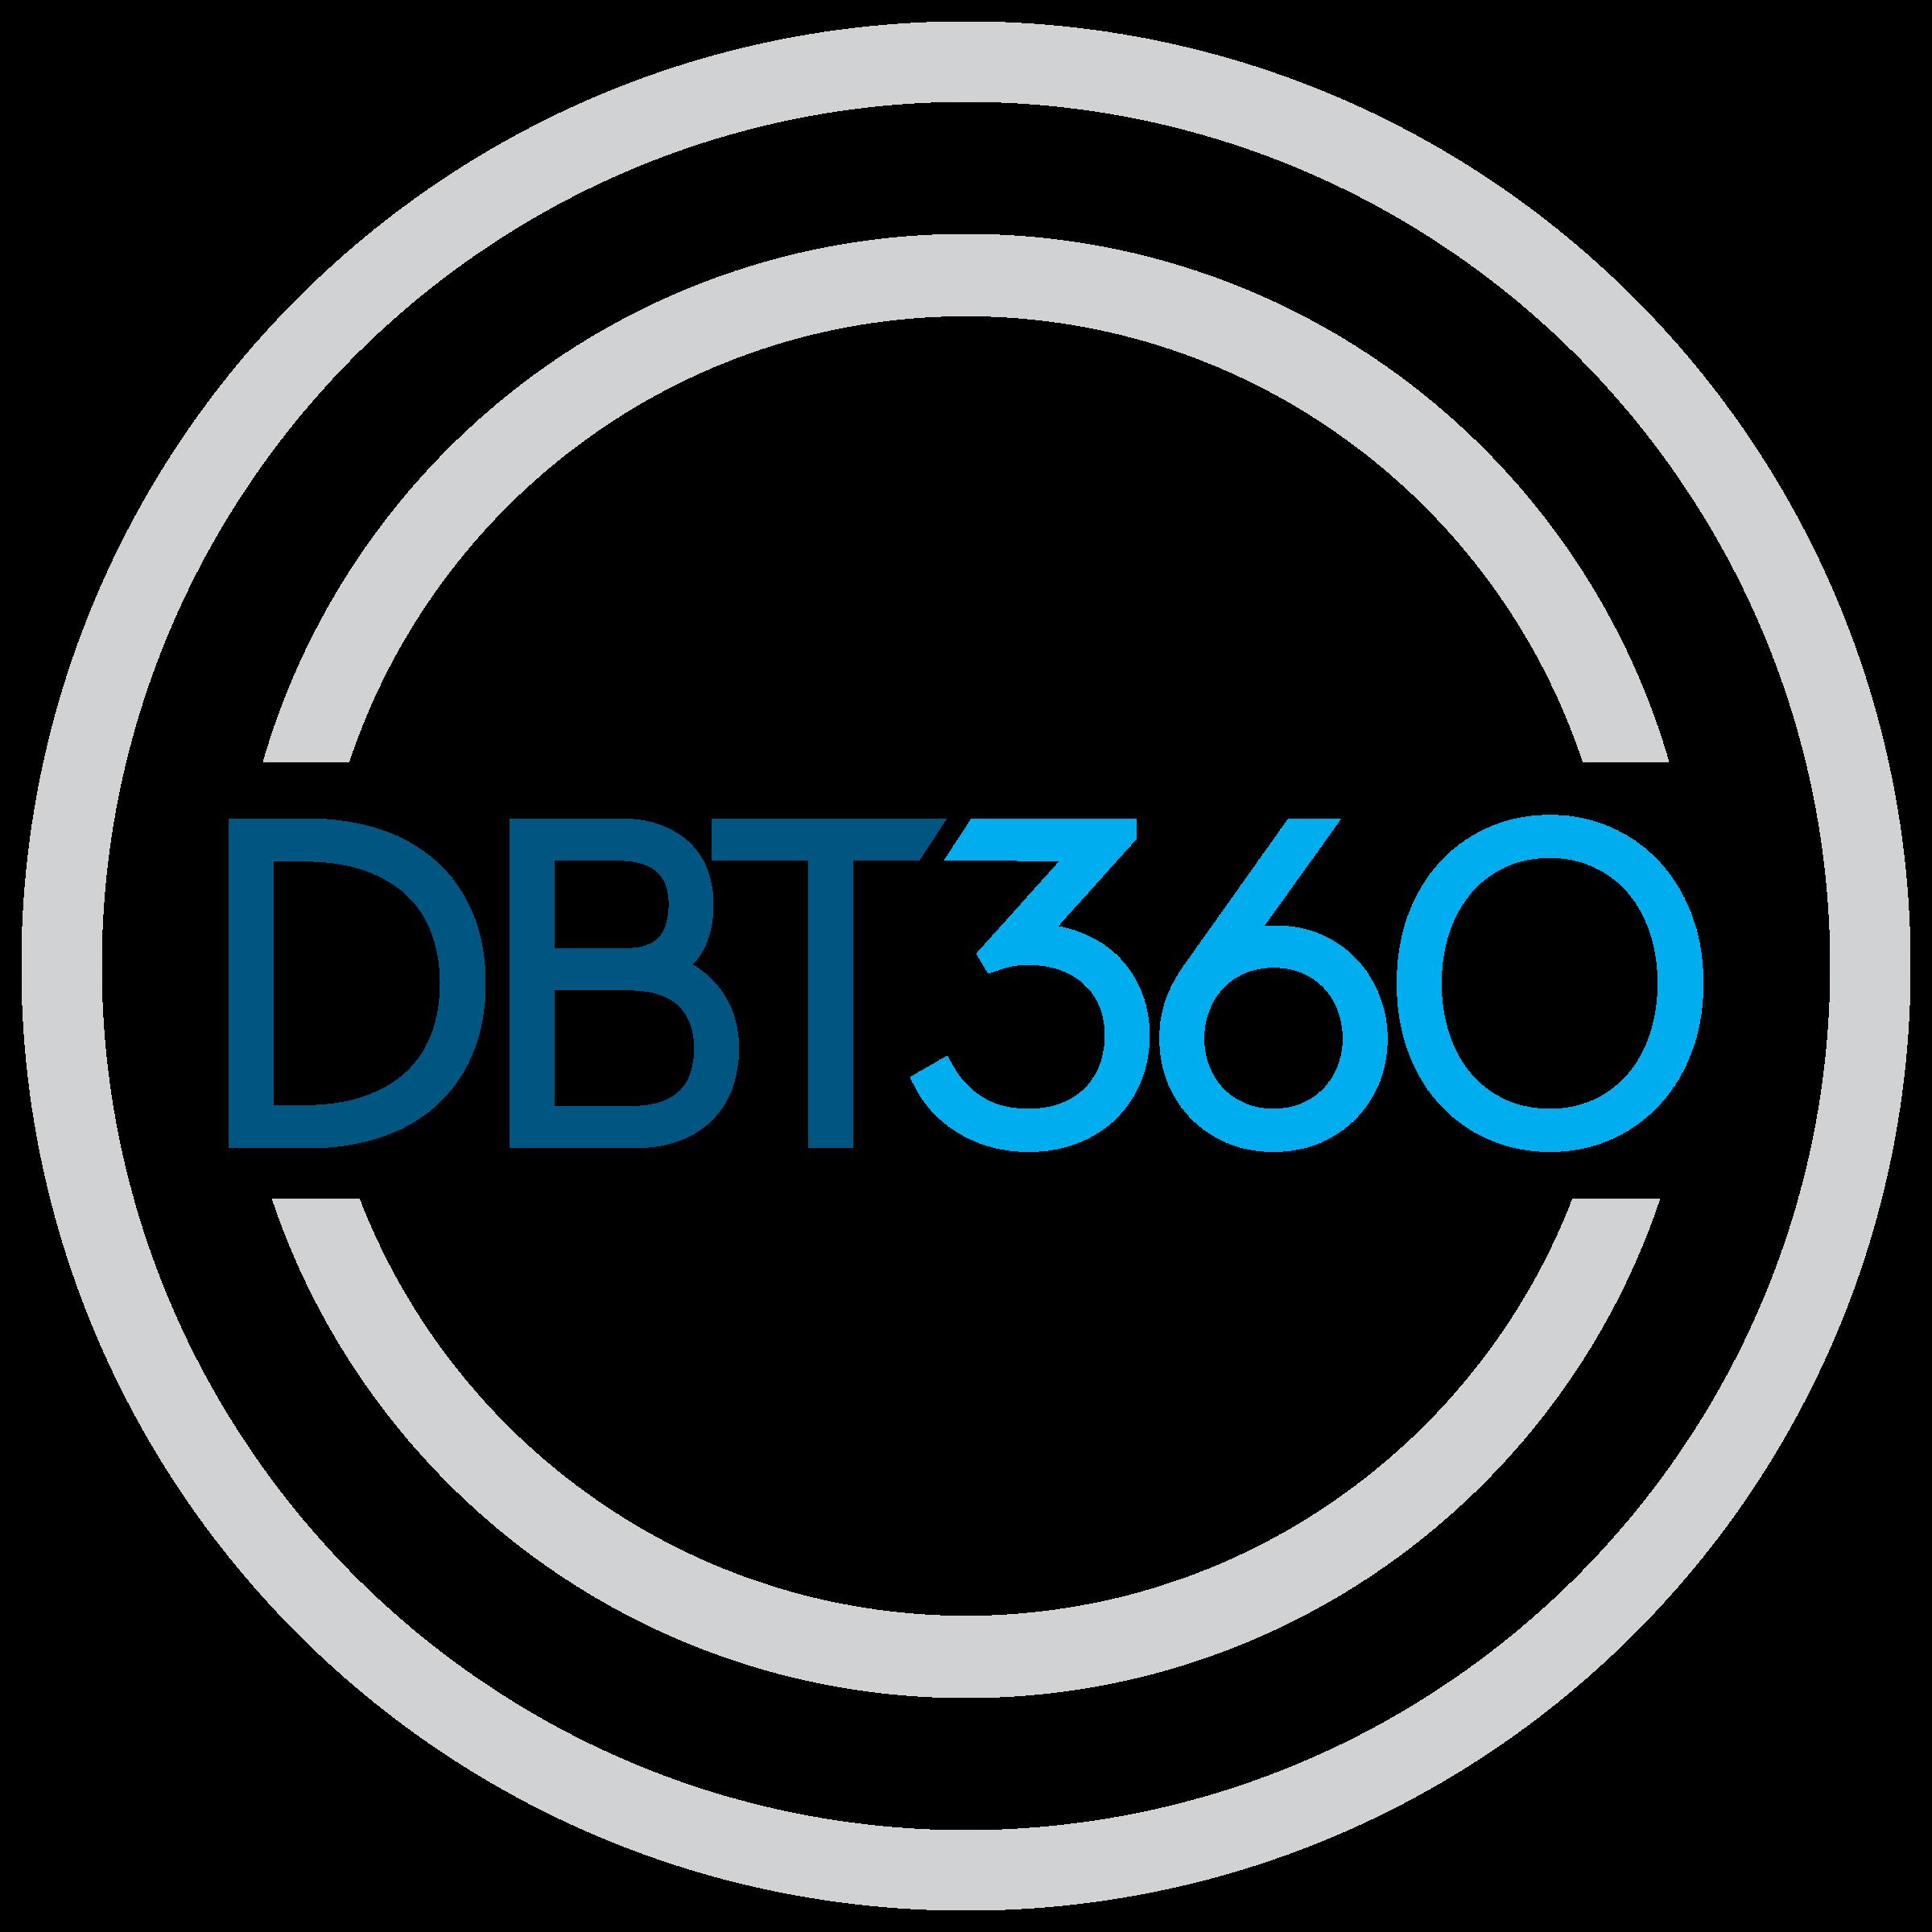 DBT360 Financial Plan